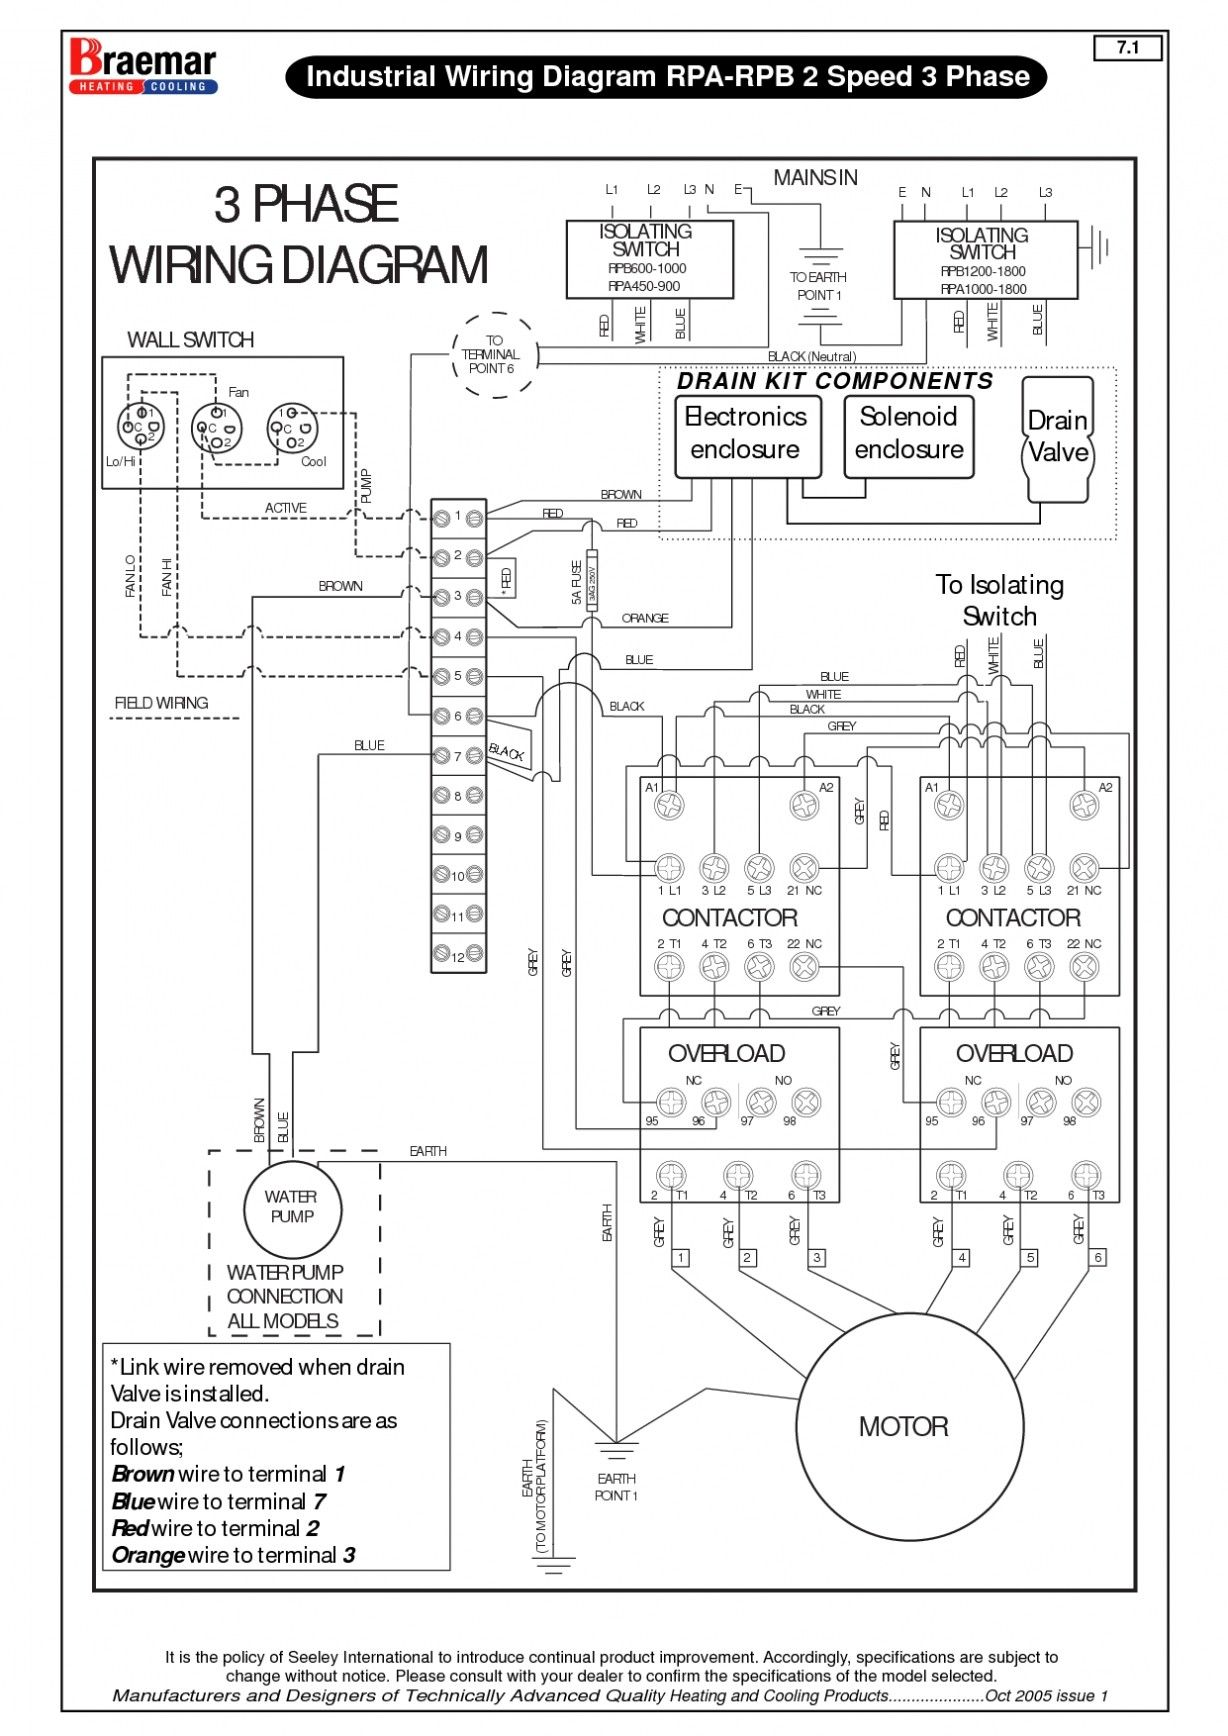 small resolution of unique motor terminal connection diagram diagram wiringdiagram diagramming diagramm visuals visualisation graphical